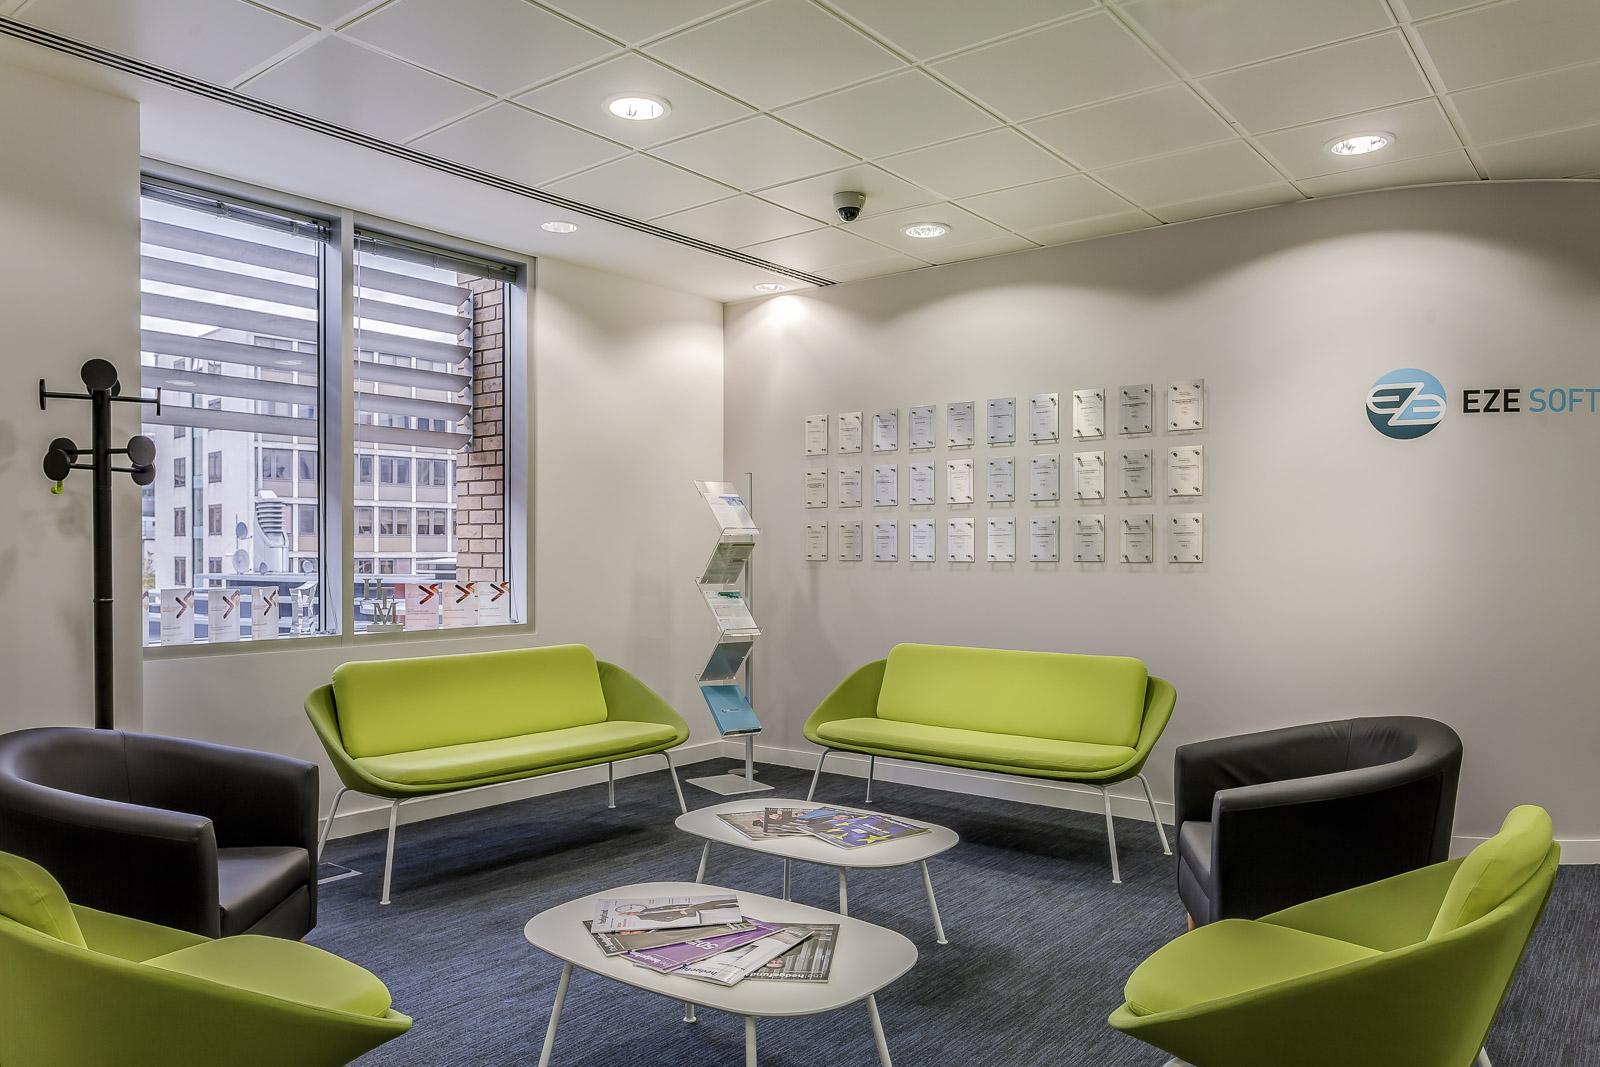 london-interiors-photographer-eze-software-office